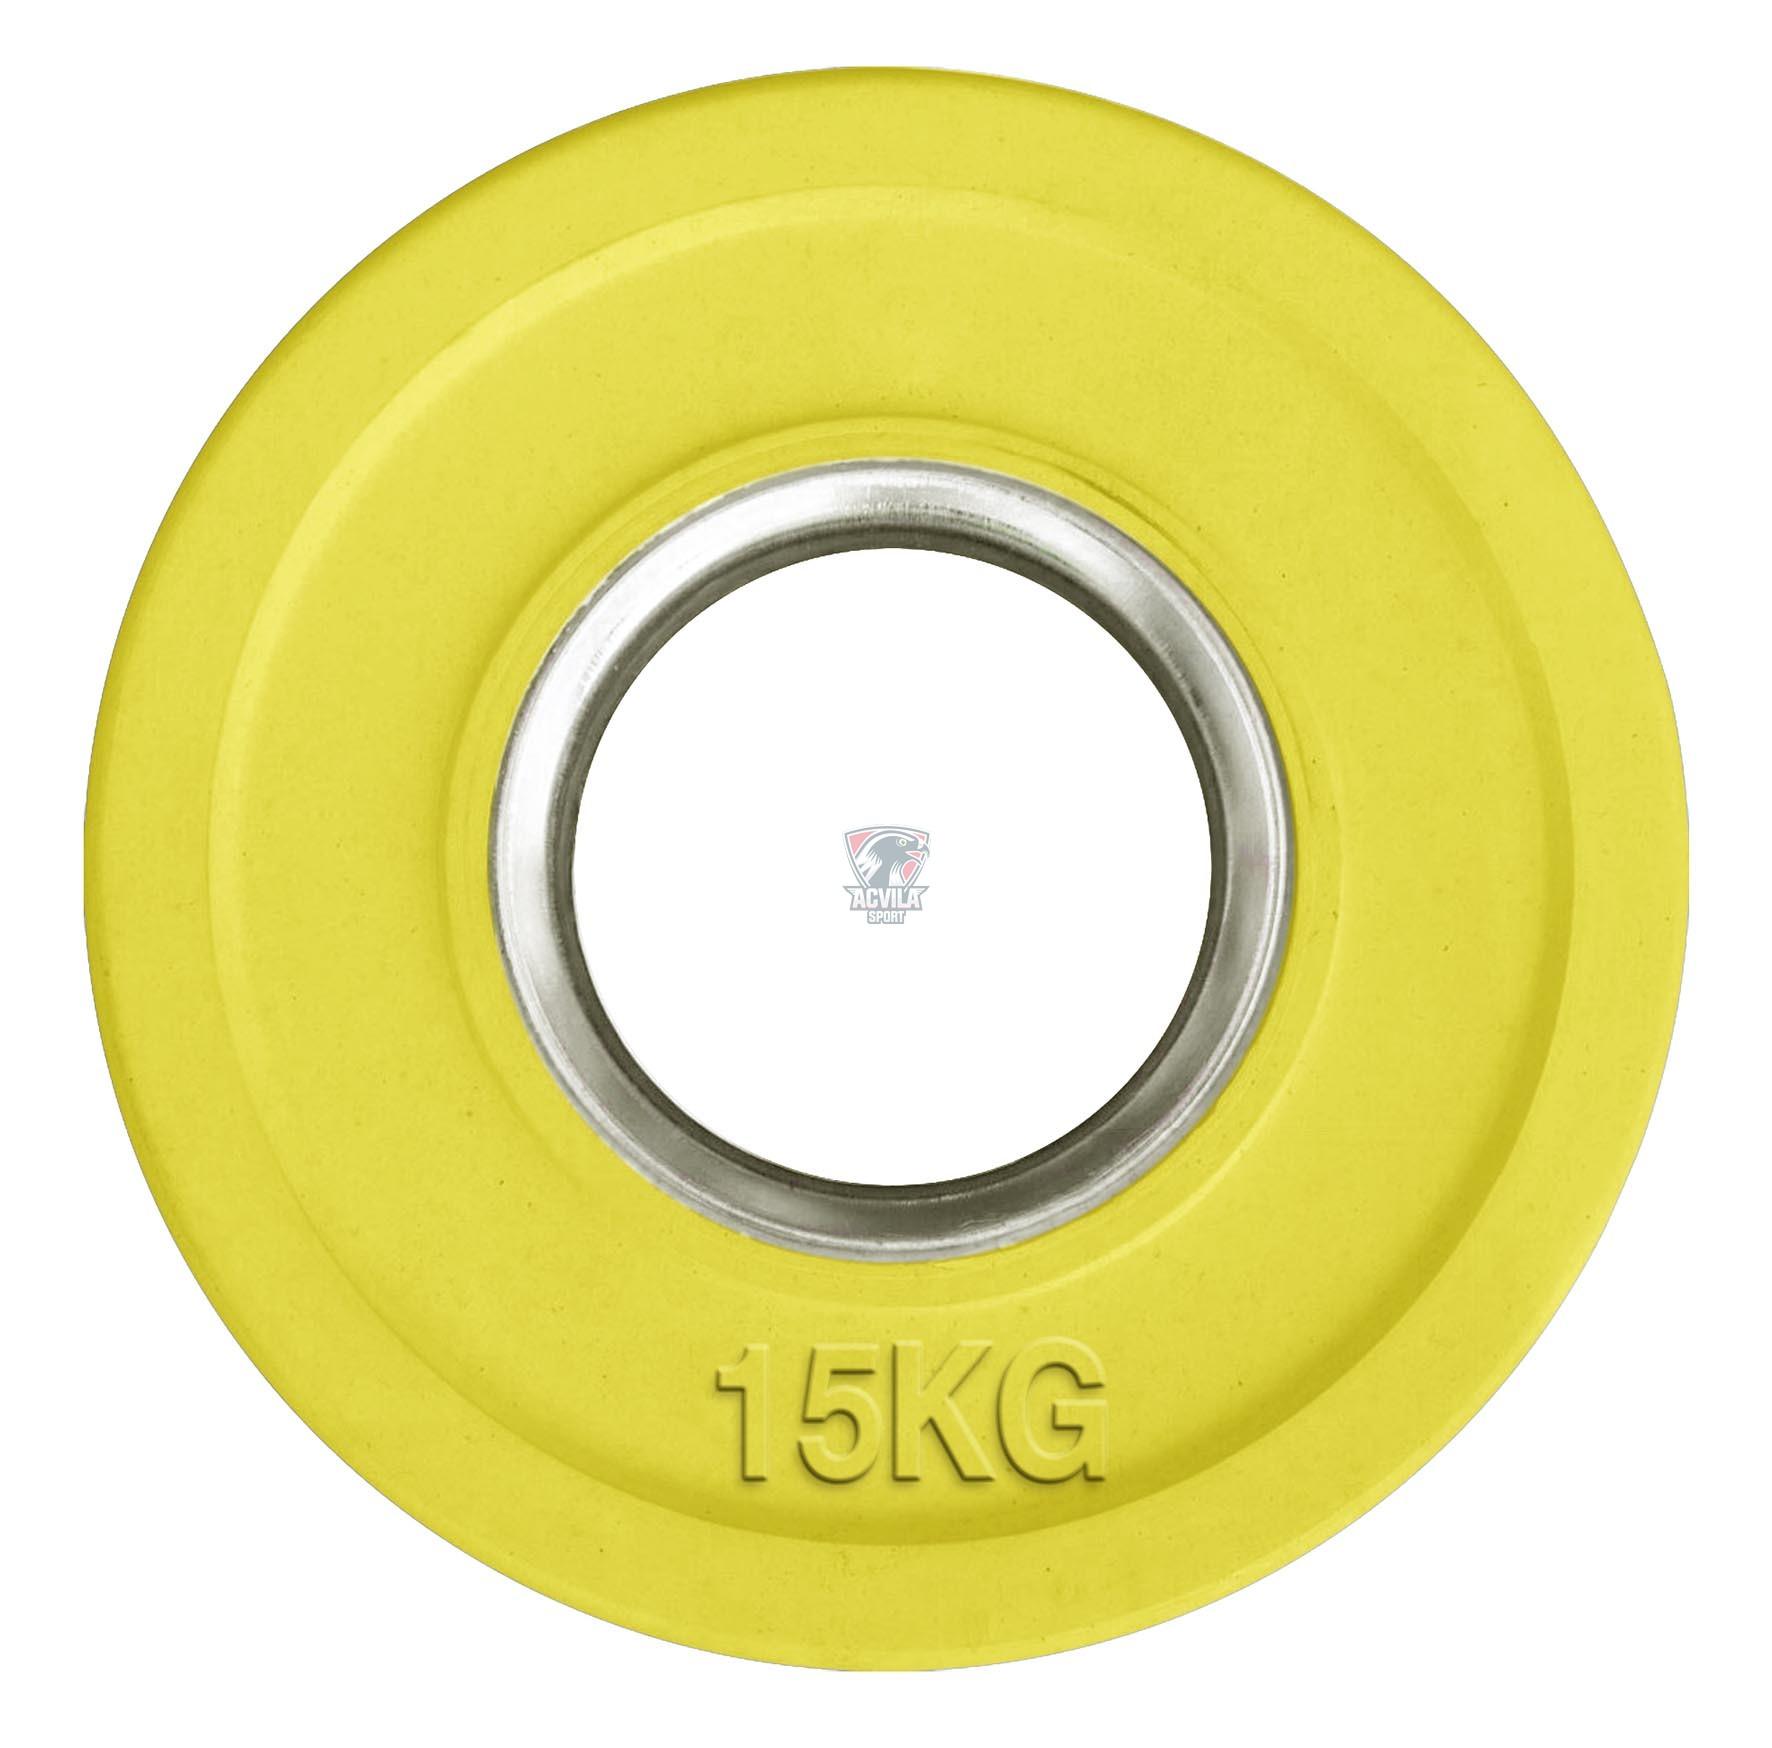 photo Greutate haltere/cauciucata color 15 kg